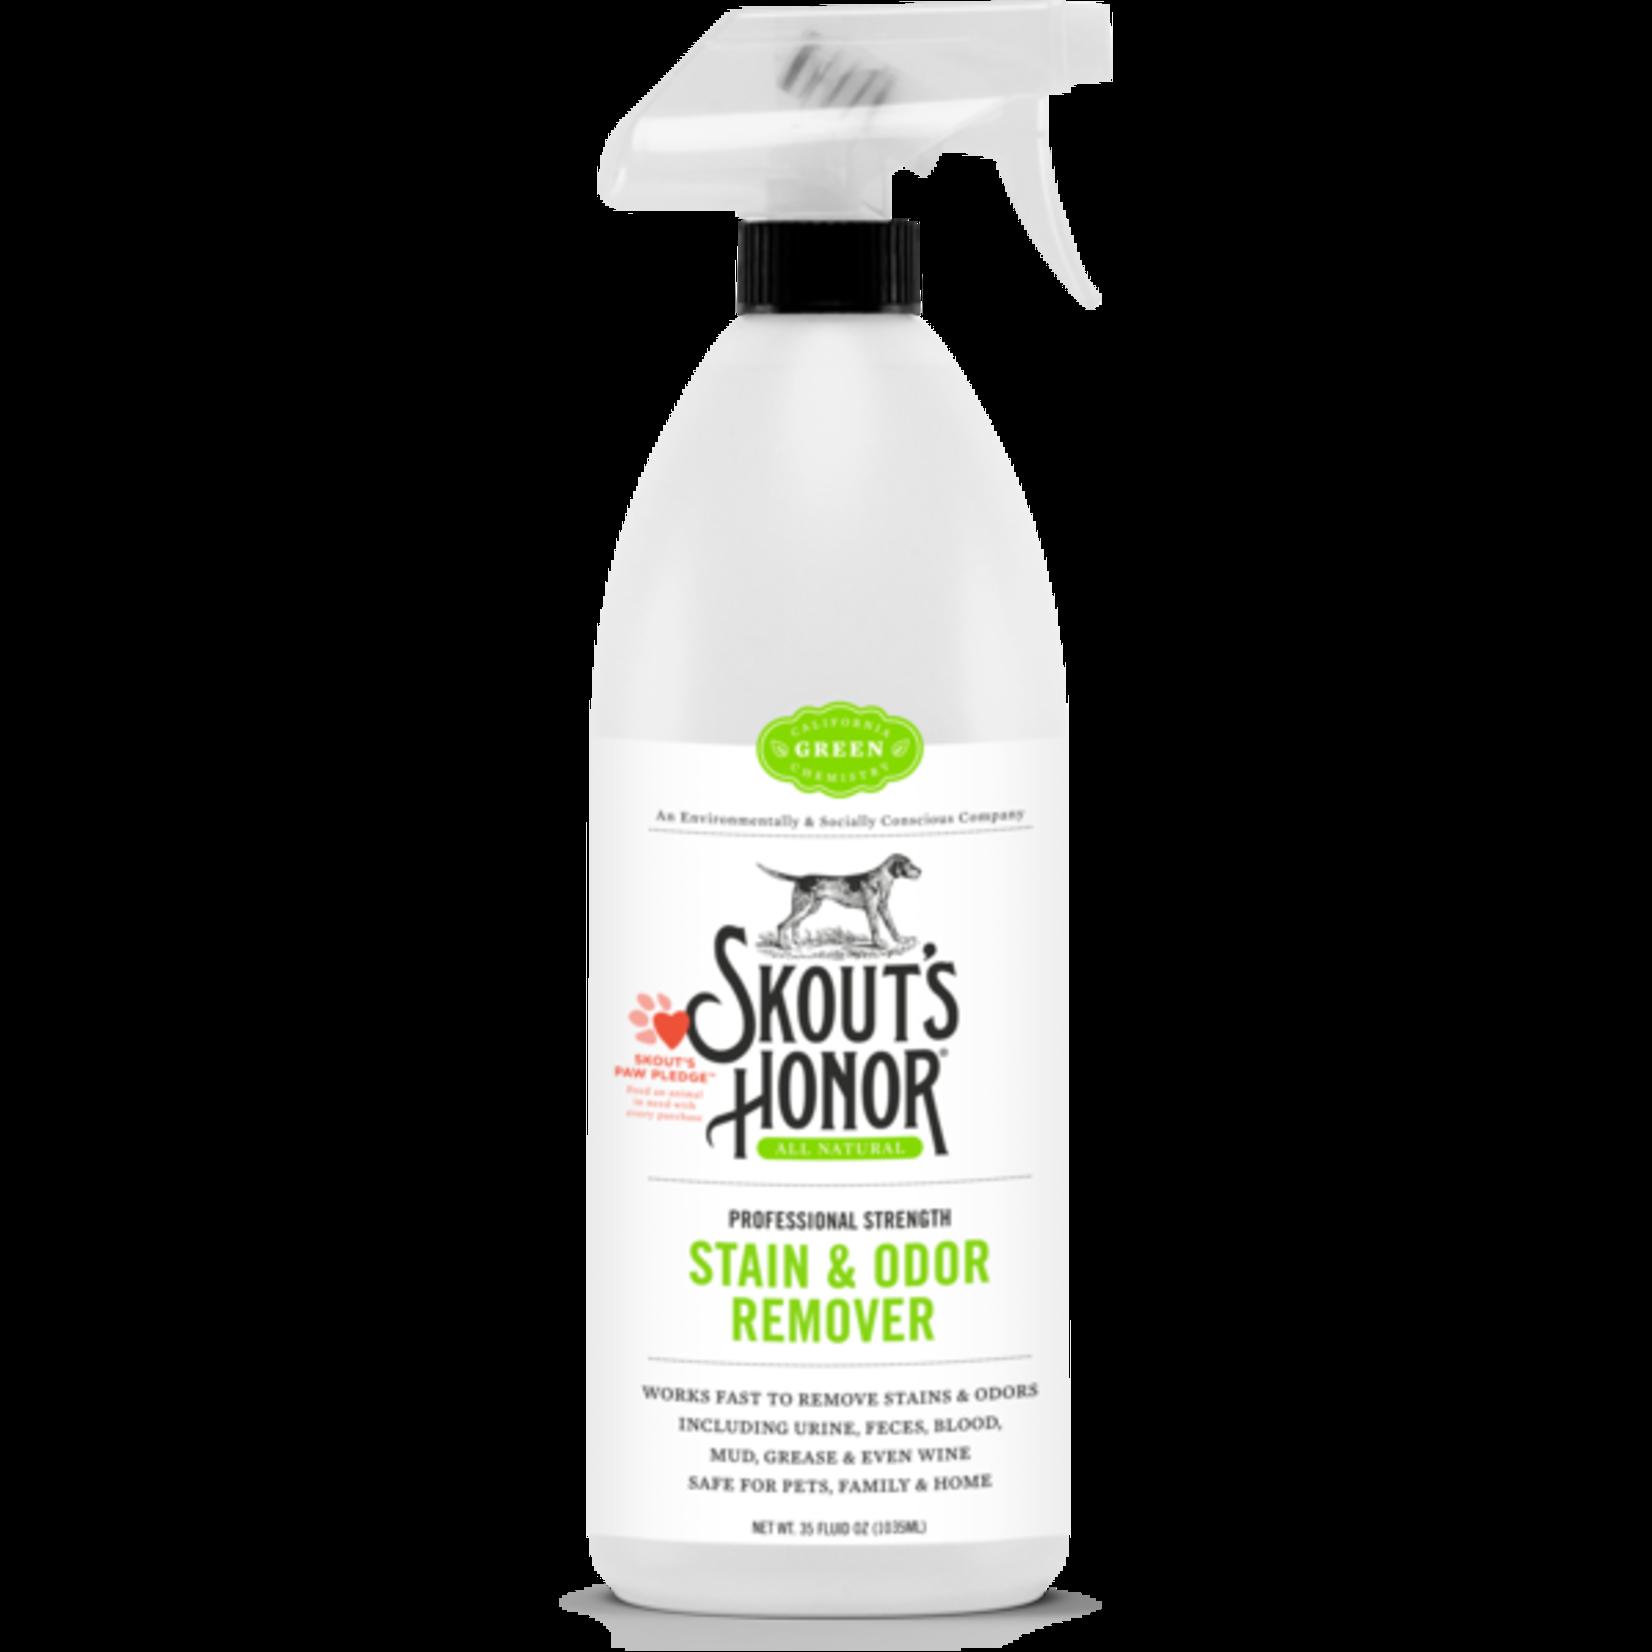 Skouts Honor SKOUTS Stain & Odor Remover Green 32oz